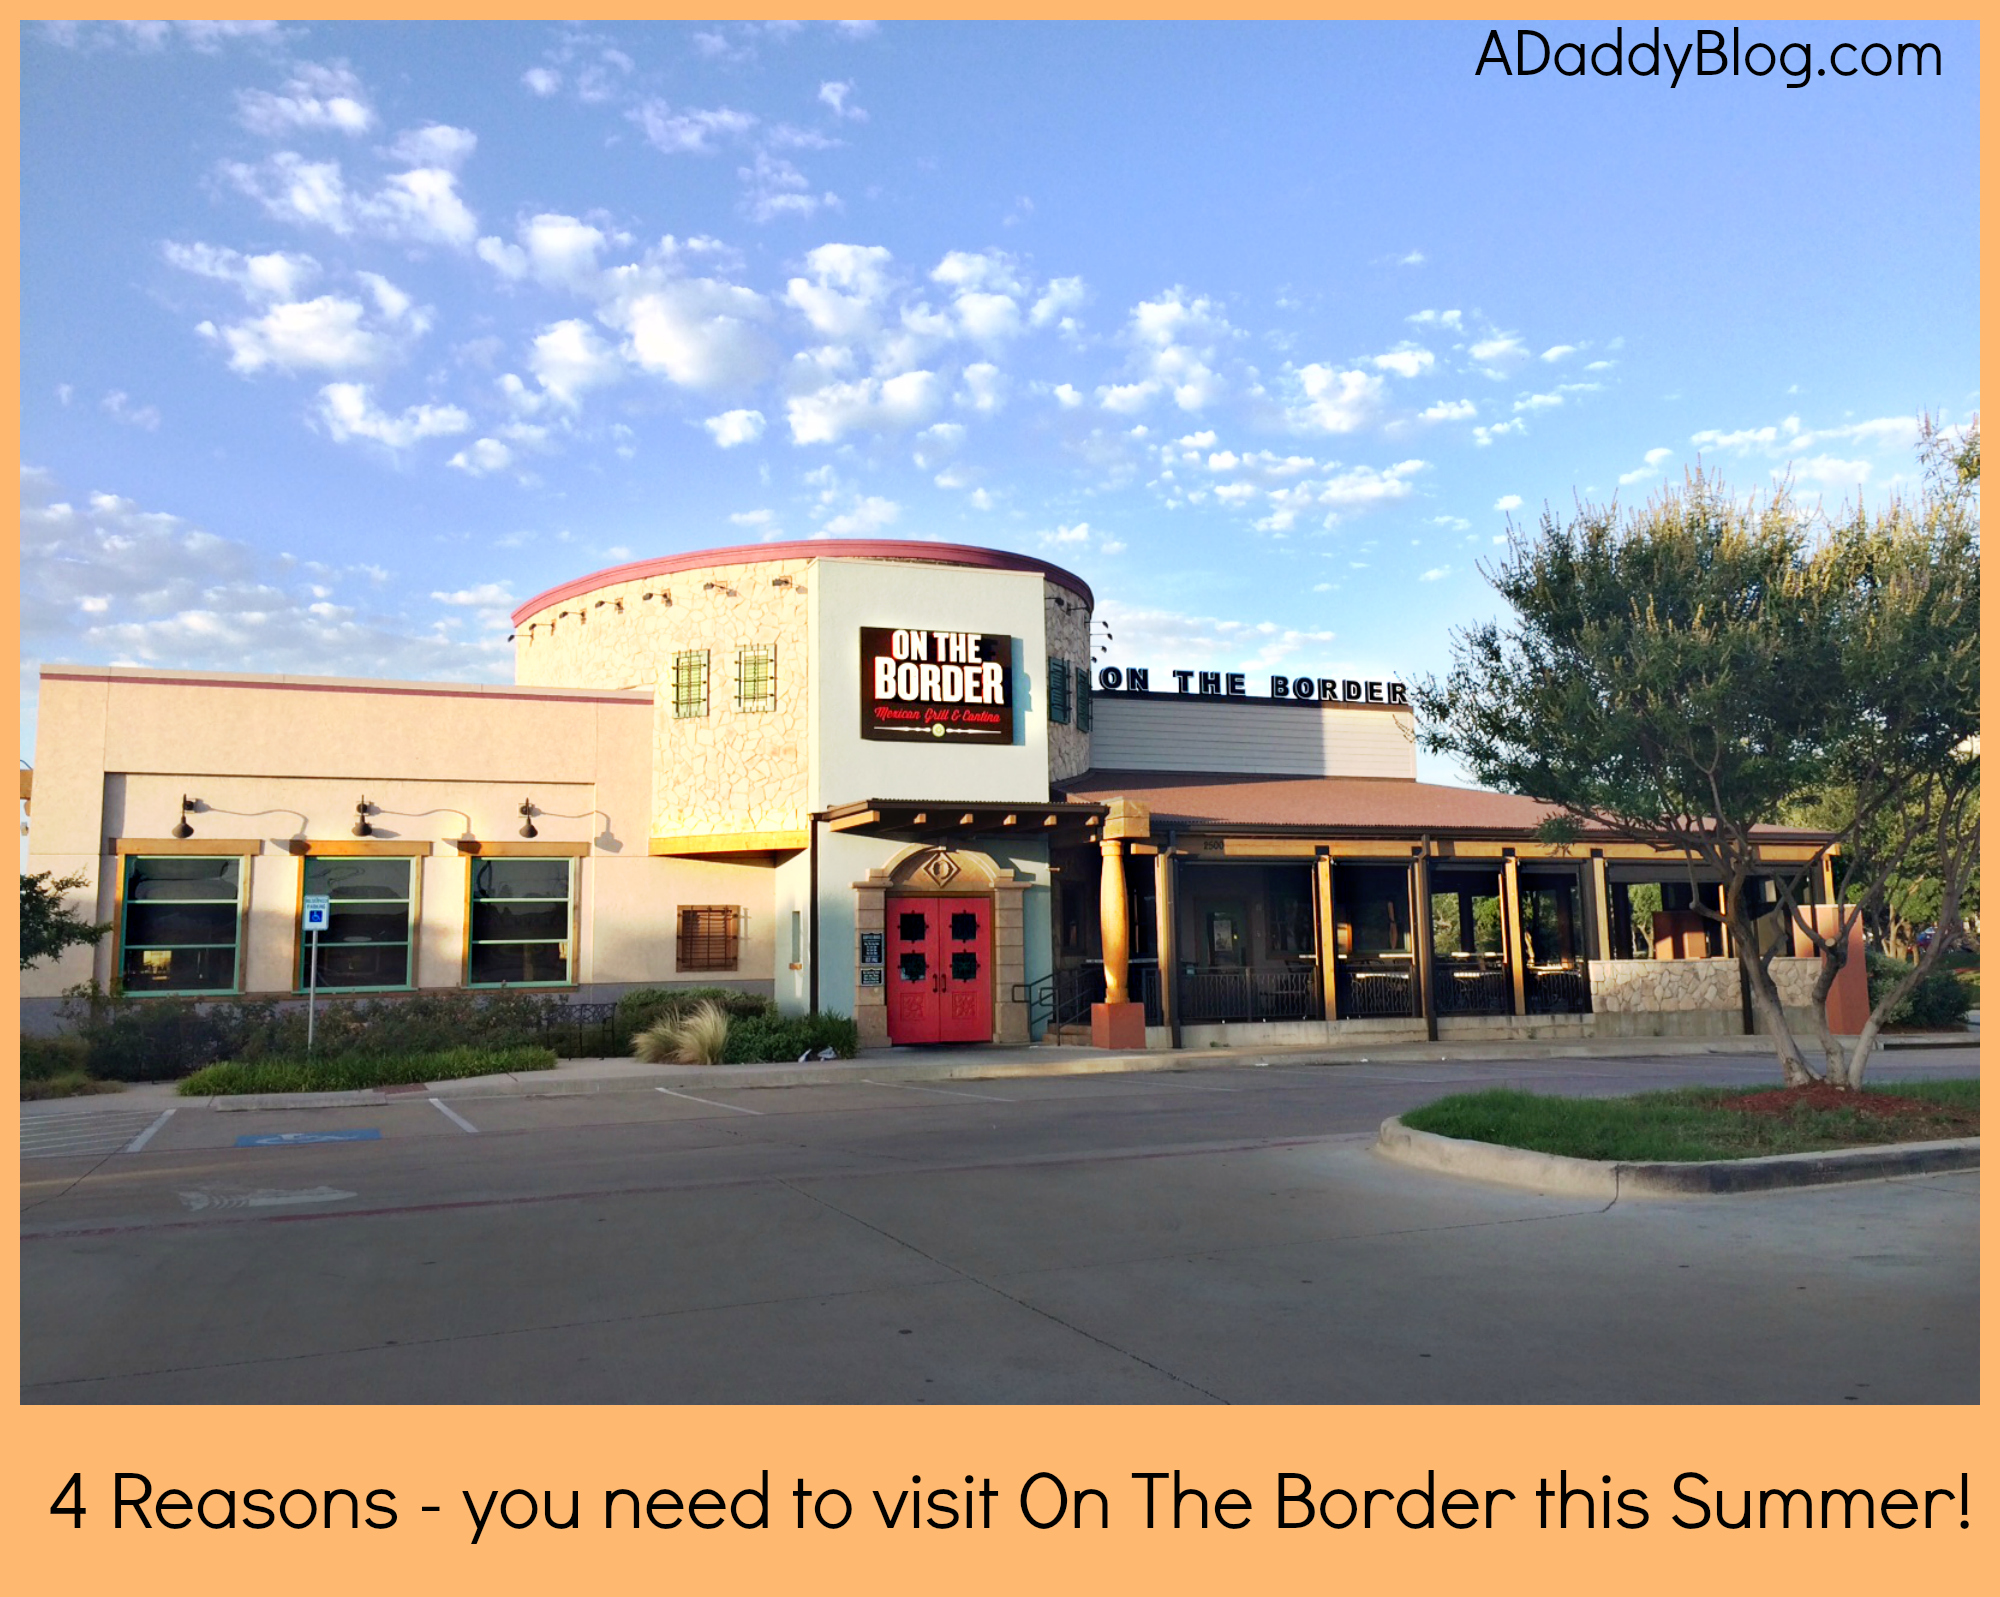 visit on the border